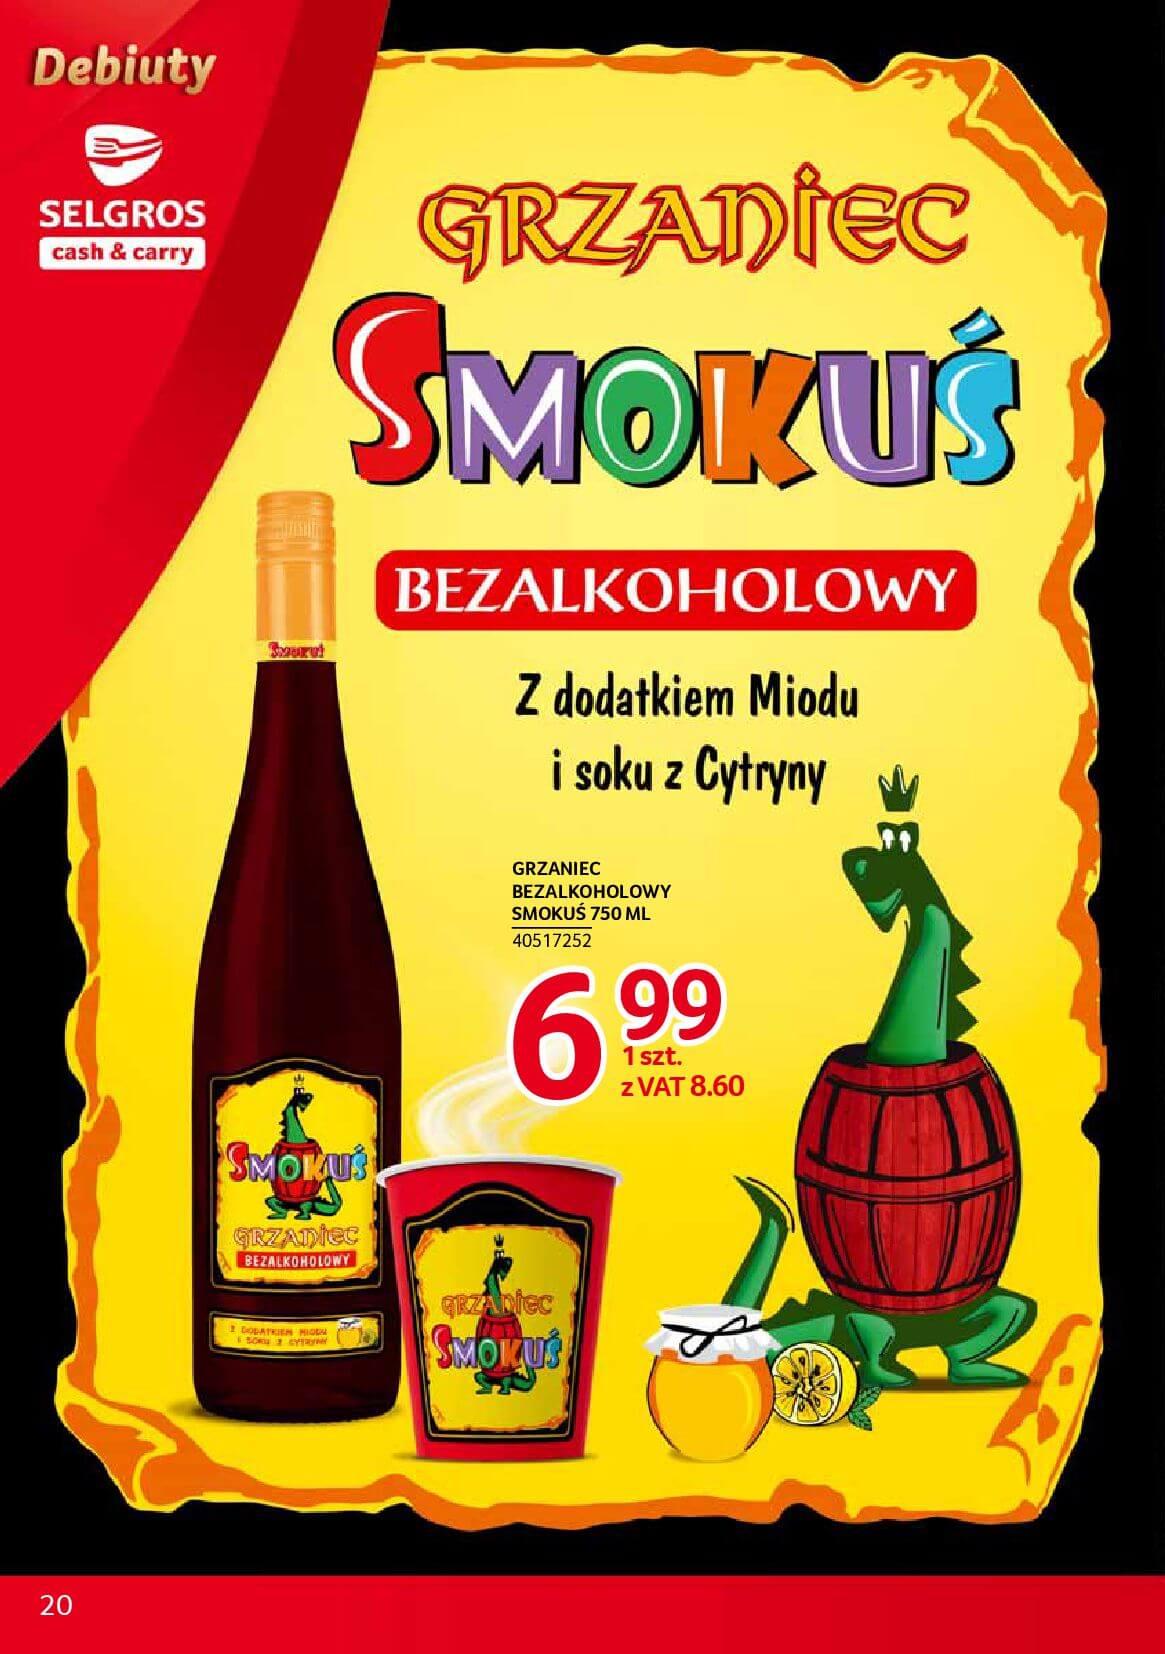 Gazetka Selgros - Debiuty-04.12.2018-16.12.2018-page-